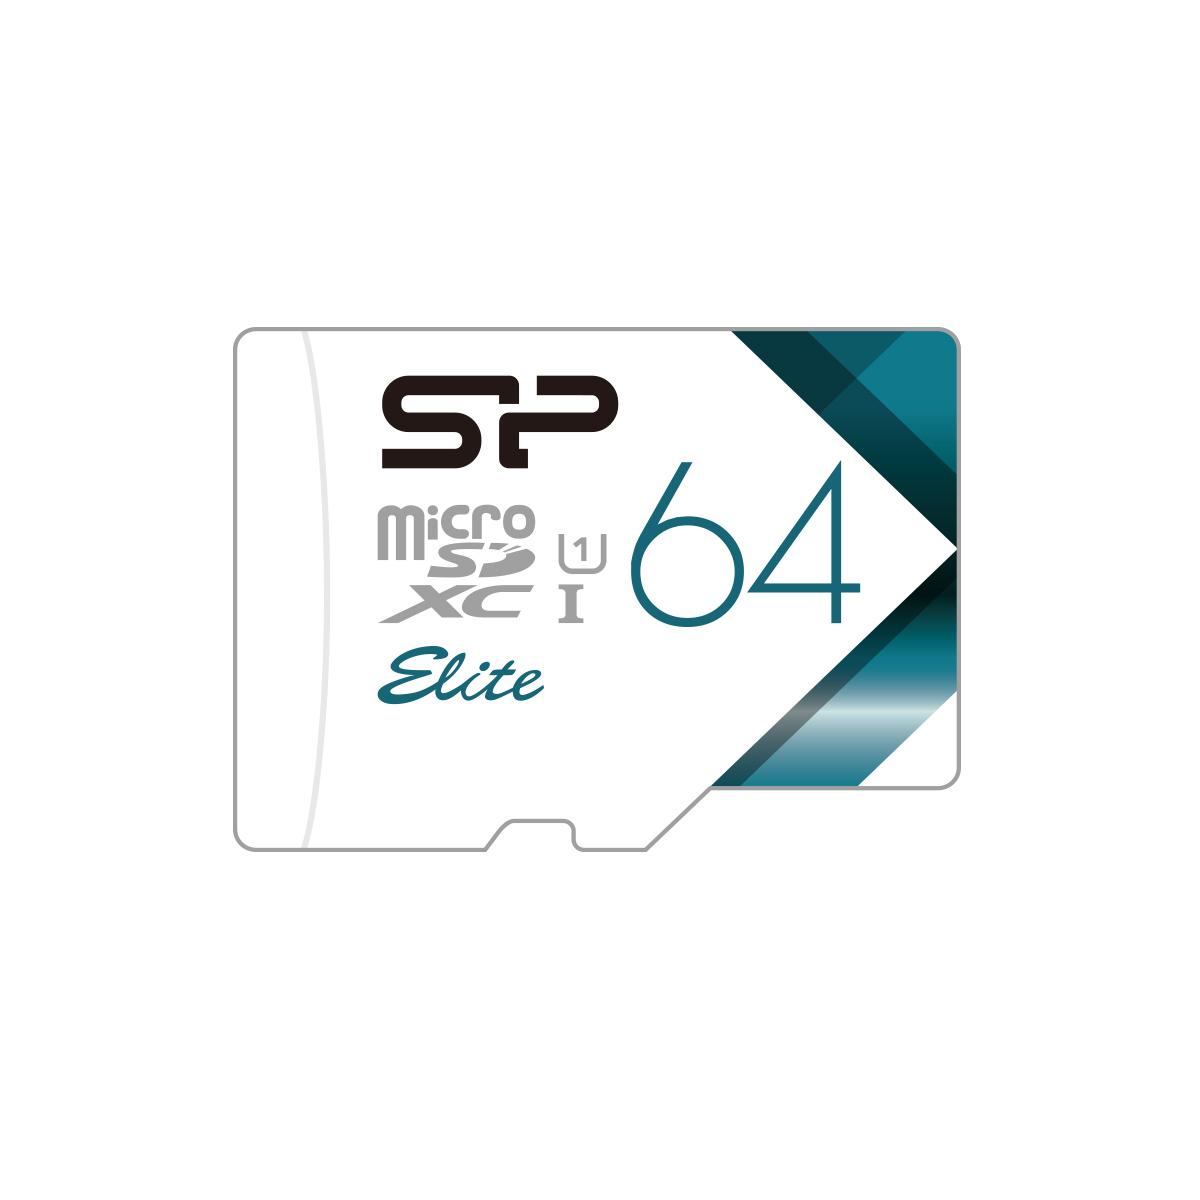 Elite<br>microSDHC/SDXC_Colorful<br><font color='#888888' size='2%'>(Class 10. UHS-I U1. Full HD)</font>